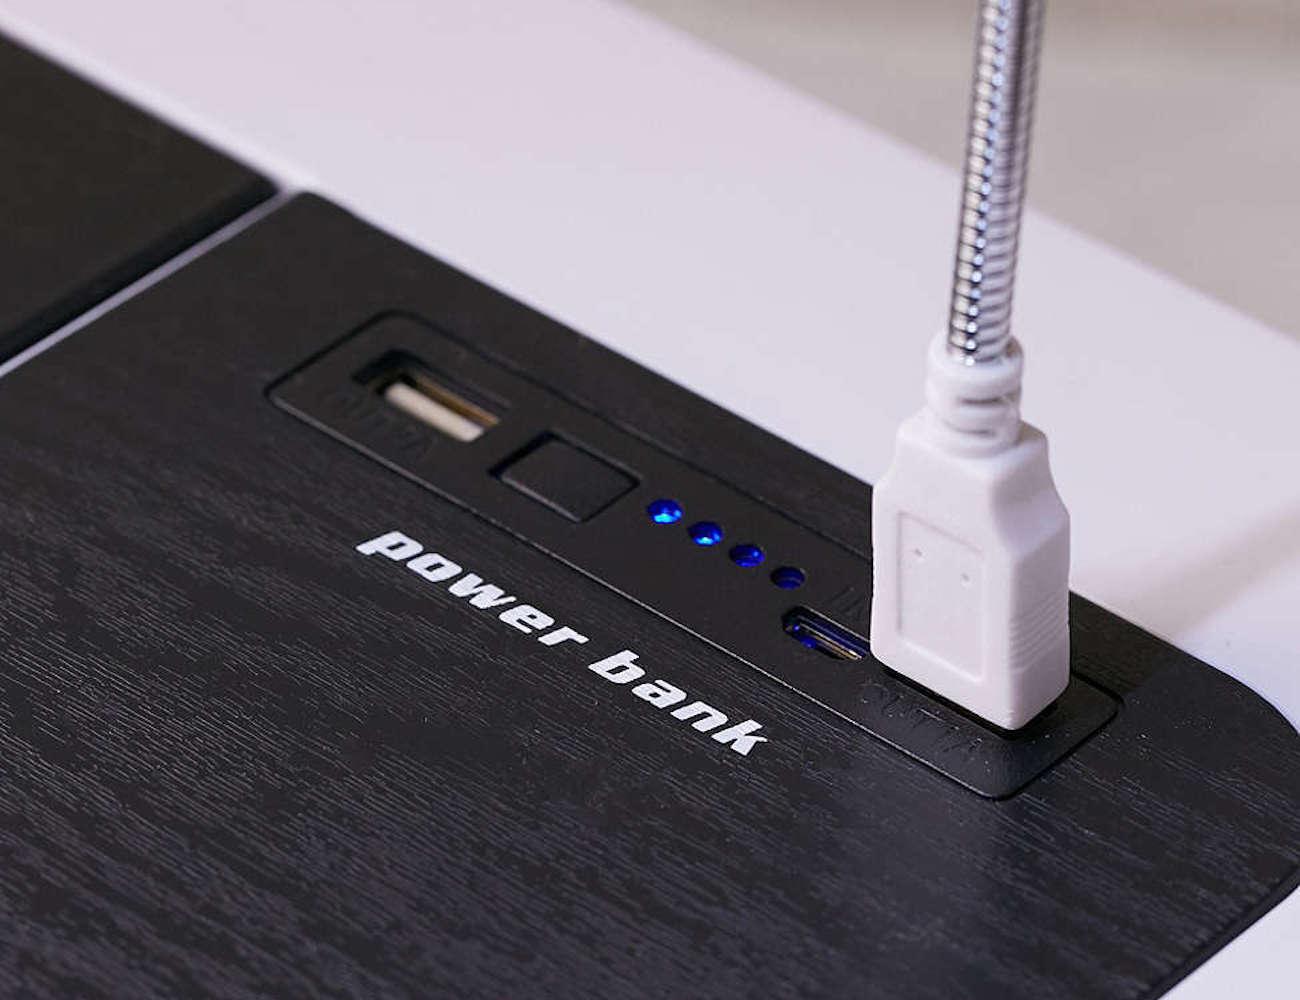 iCharge Portable Charging Desk